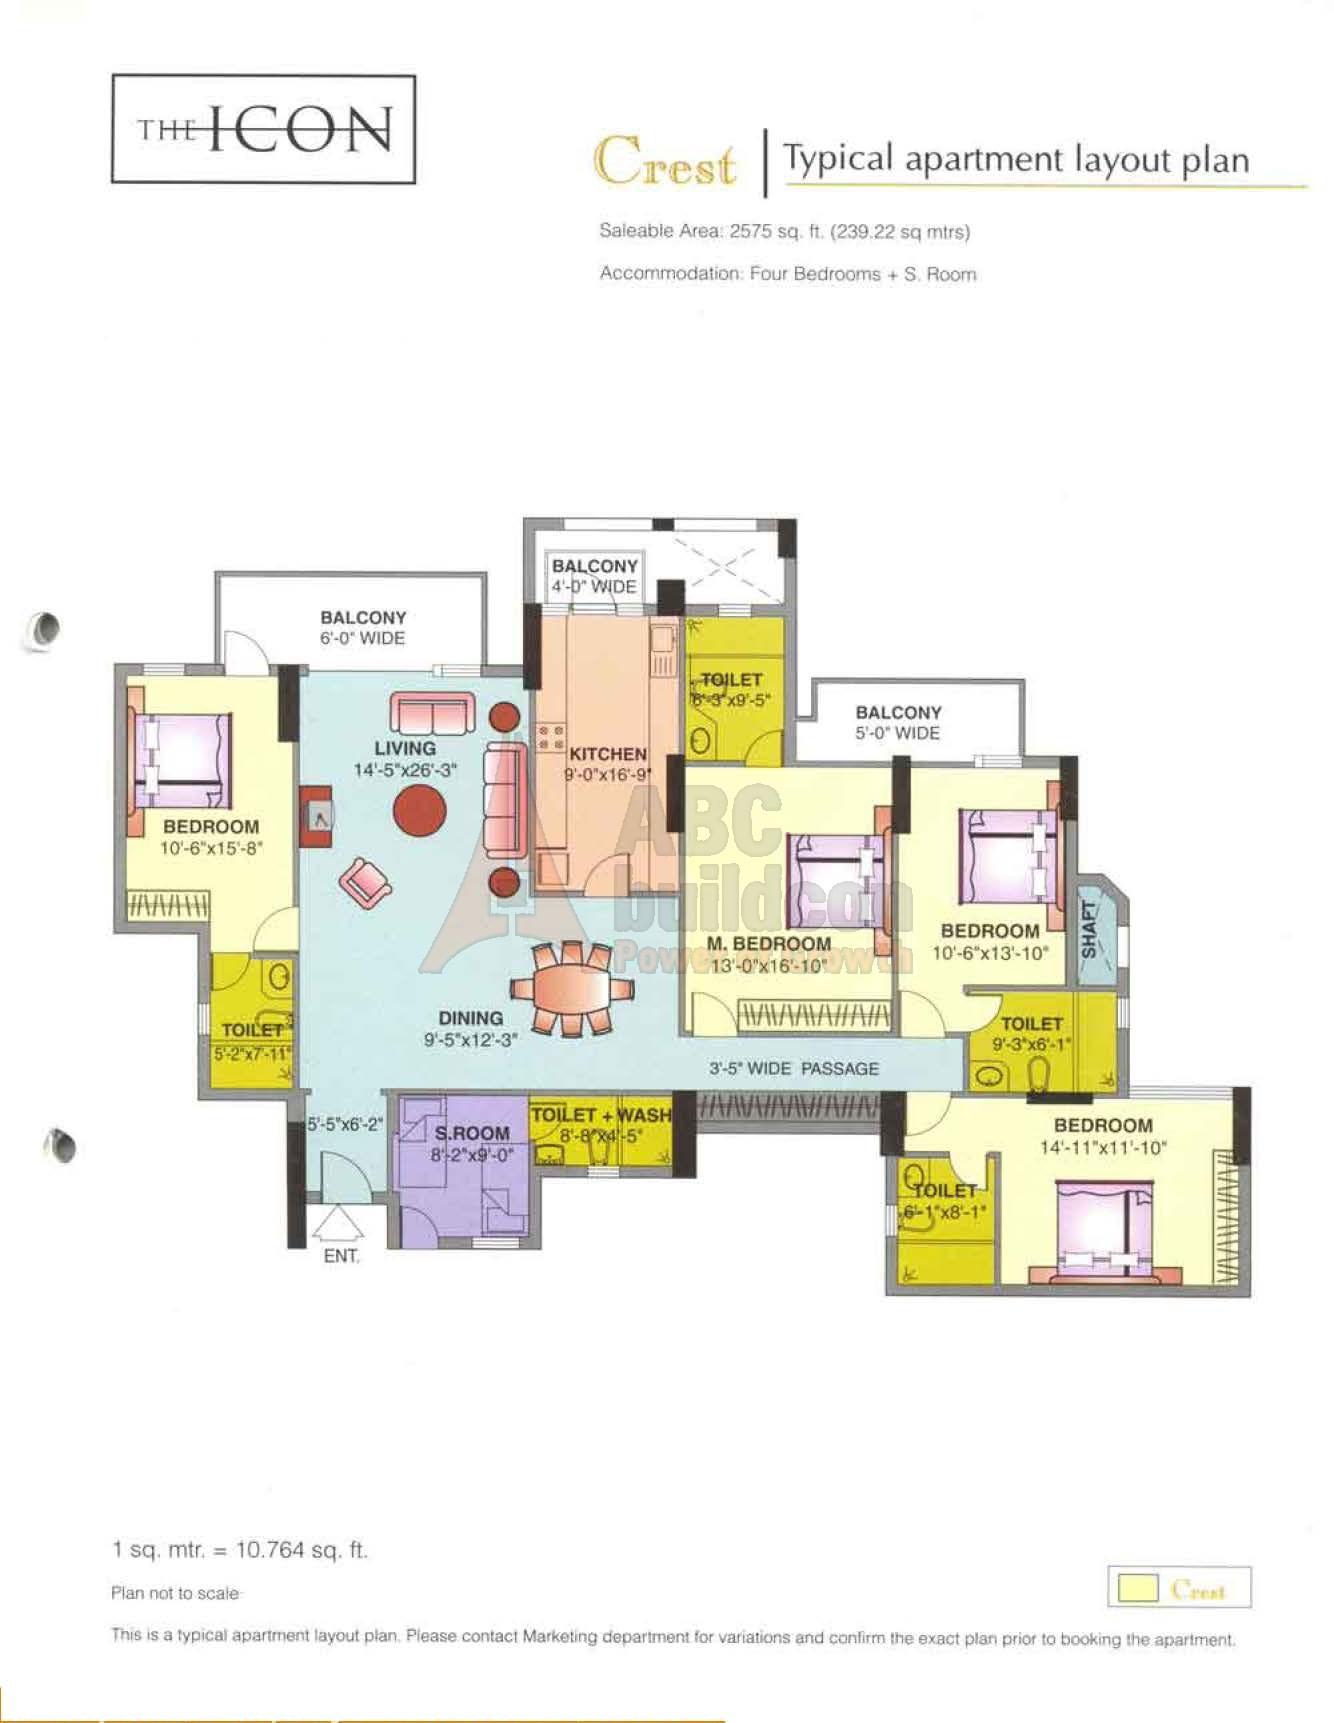 DLF Icon Floor Plan - FloorPlan in